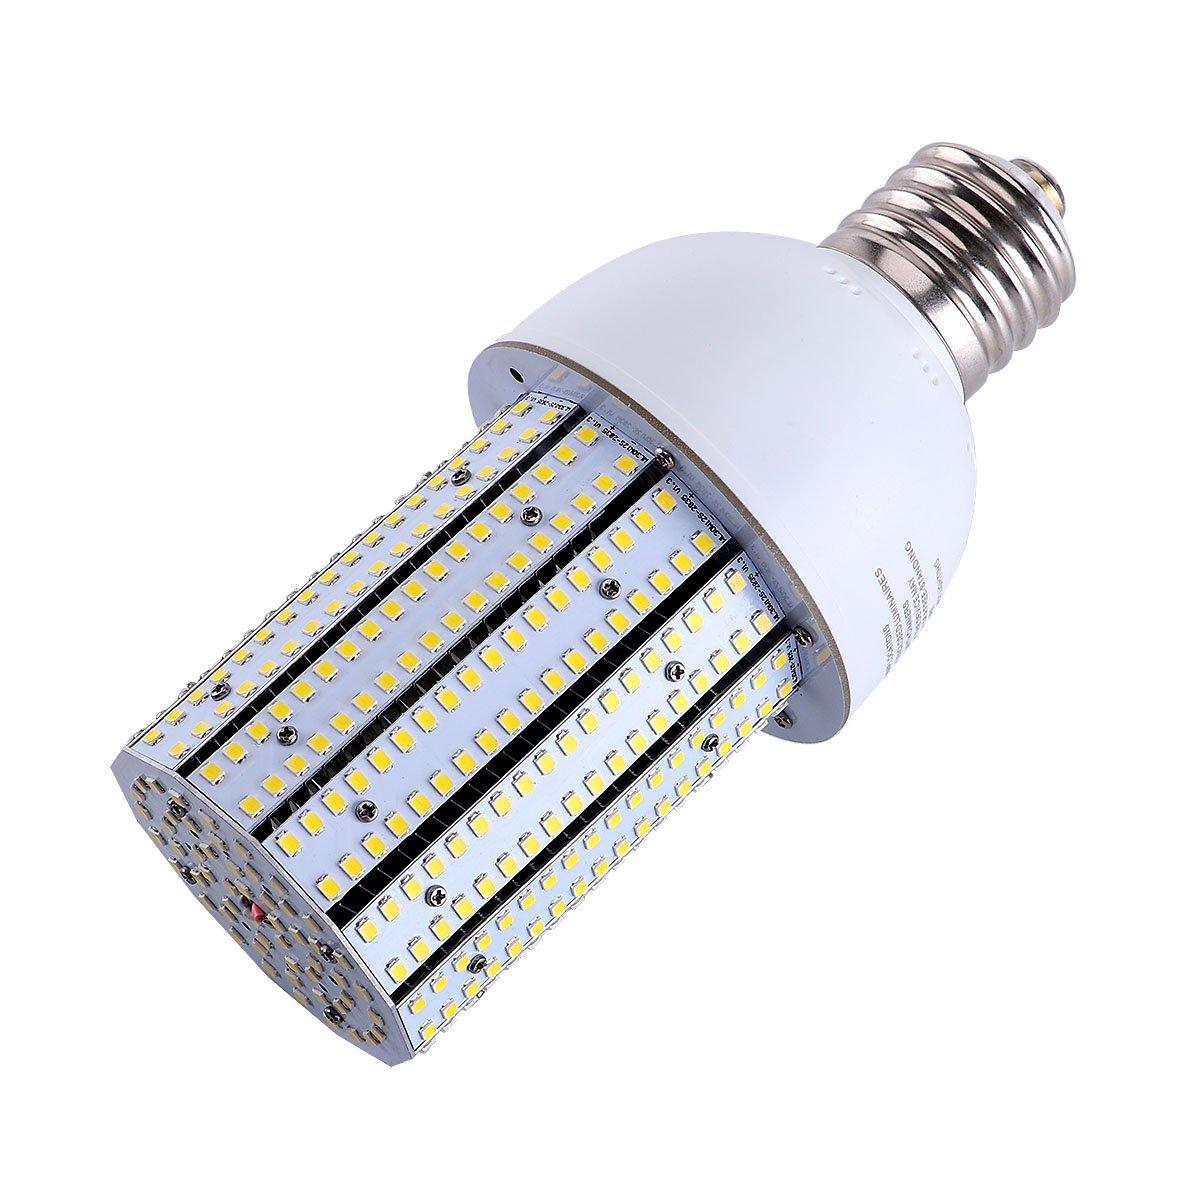 30W 5000K Daylight Led Corn Bulbs Large Mogul Screw E39 Base LED for Low Bay Street Lamp Post Lighting Garage Factory Warehouse (100W CFL/MH/HID/HPS)